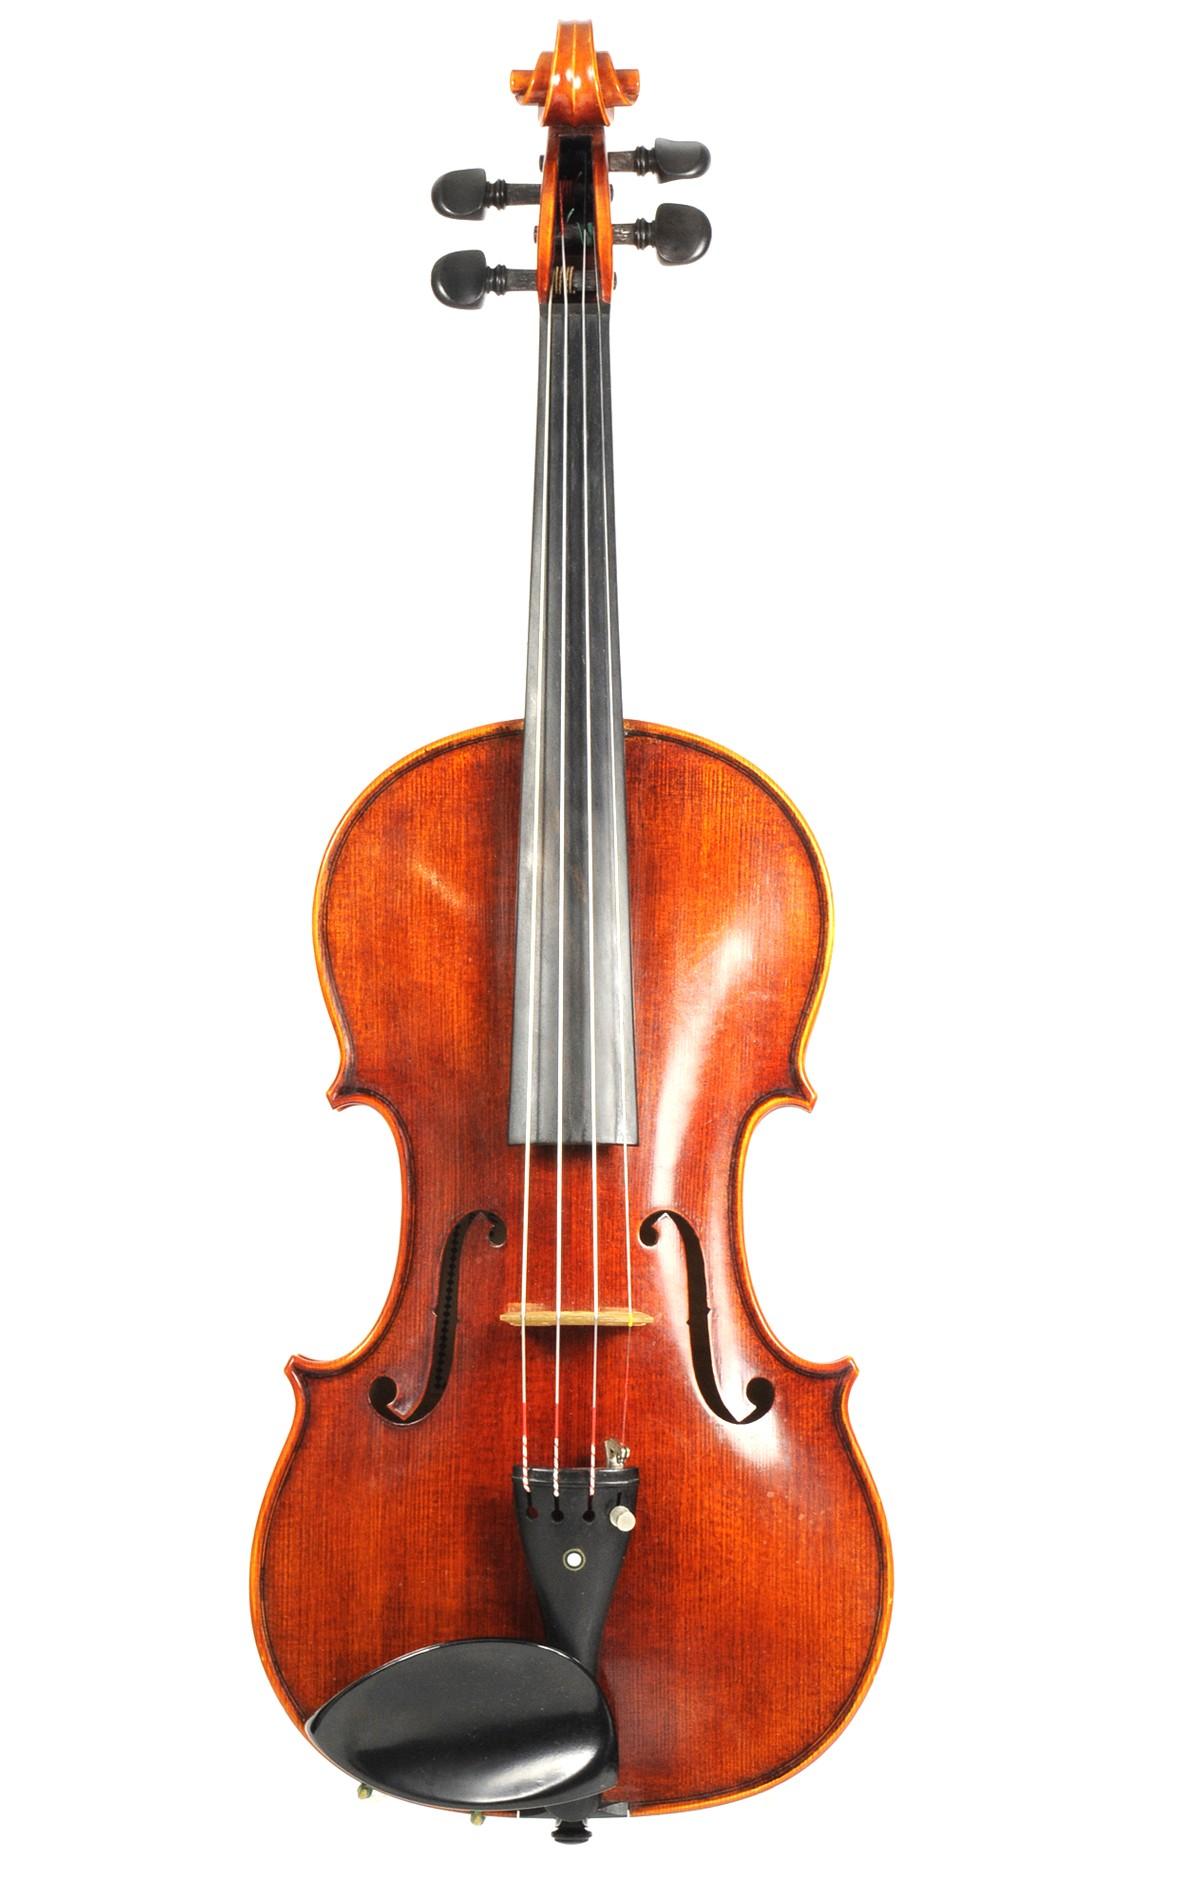 Master violin by Anton Karner Mittenwald